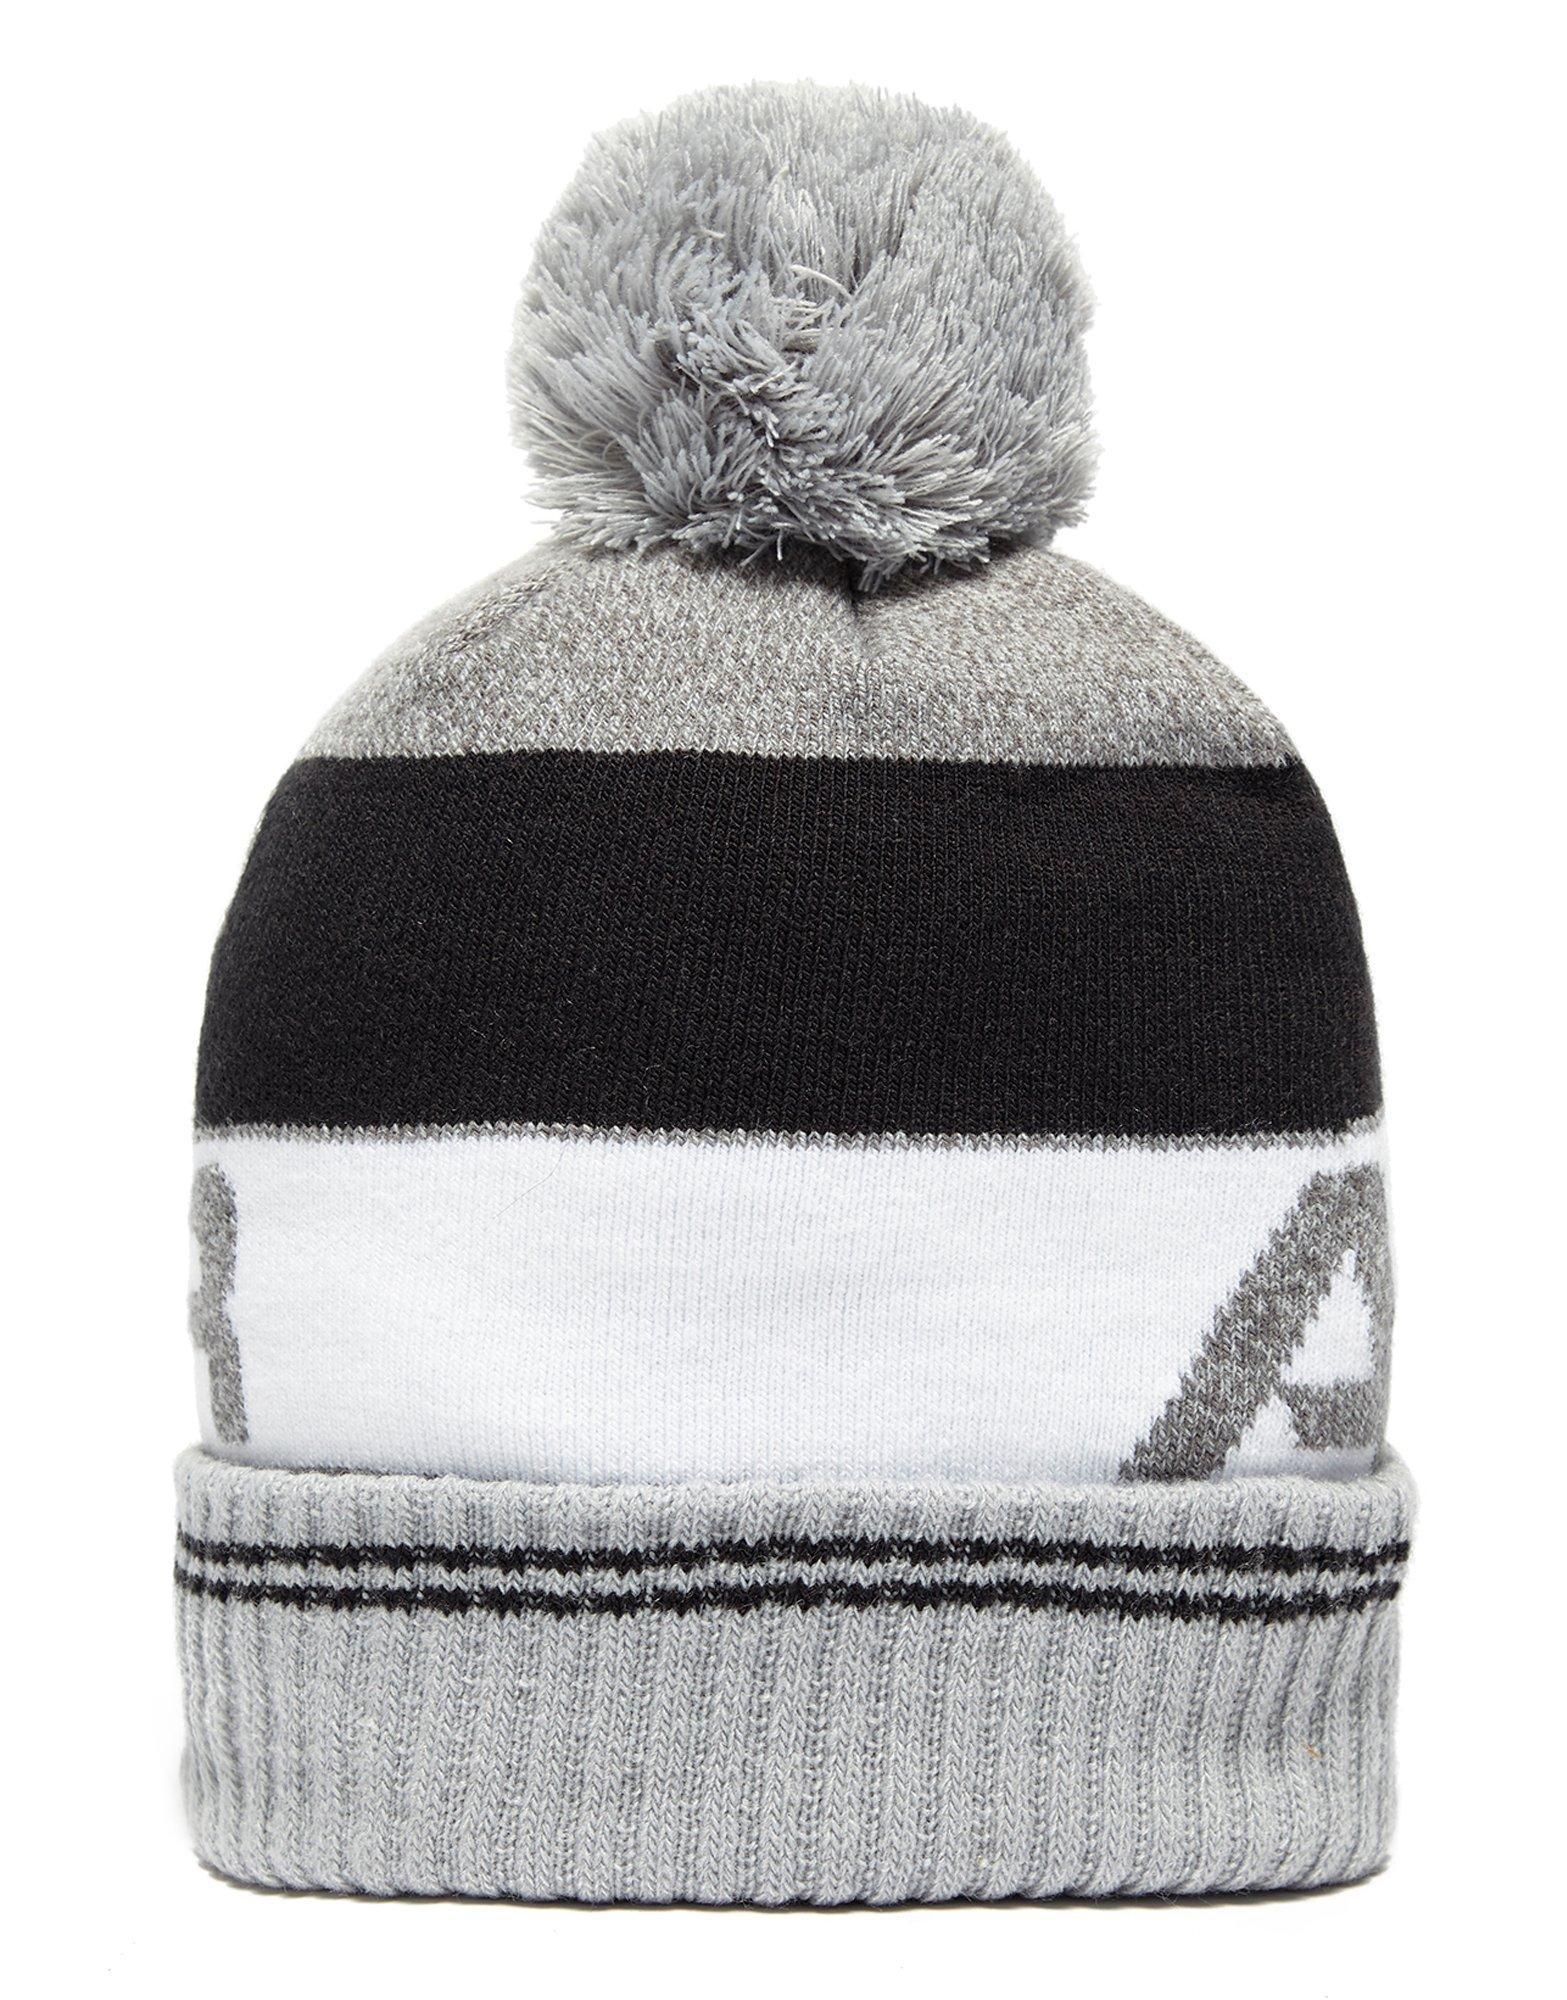 330d9630465 Lyst - Under Armour Retro Pom 2.0 Beanie Hat in Gray for Men